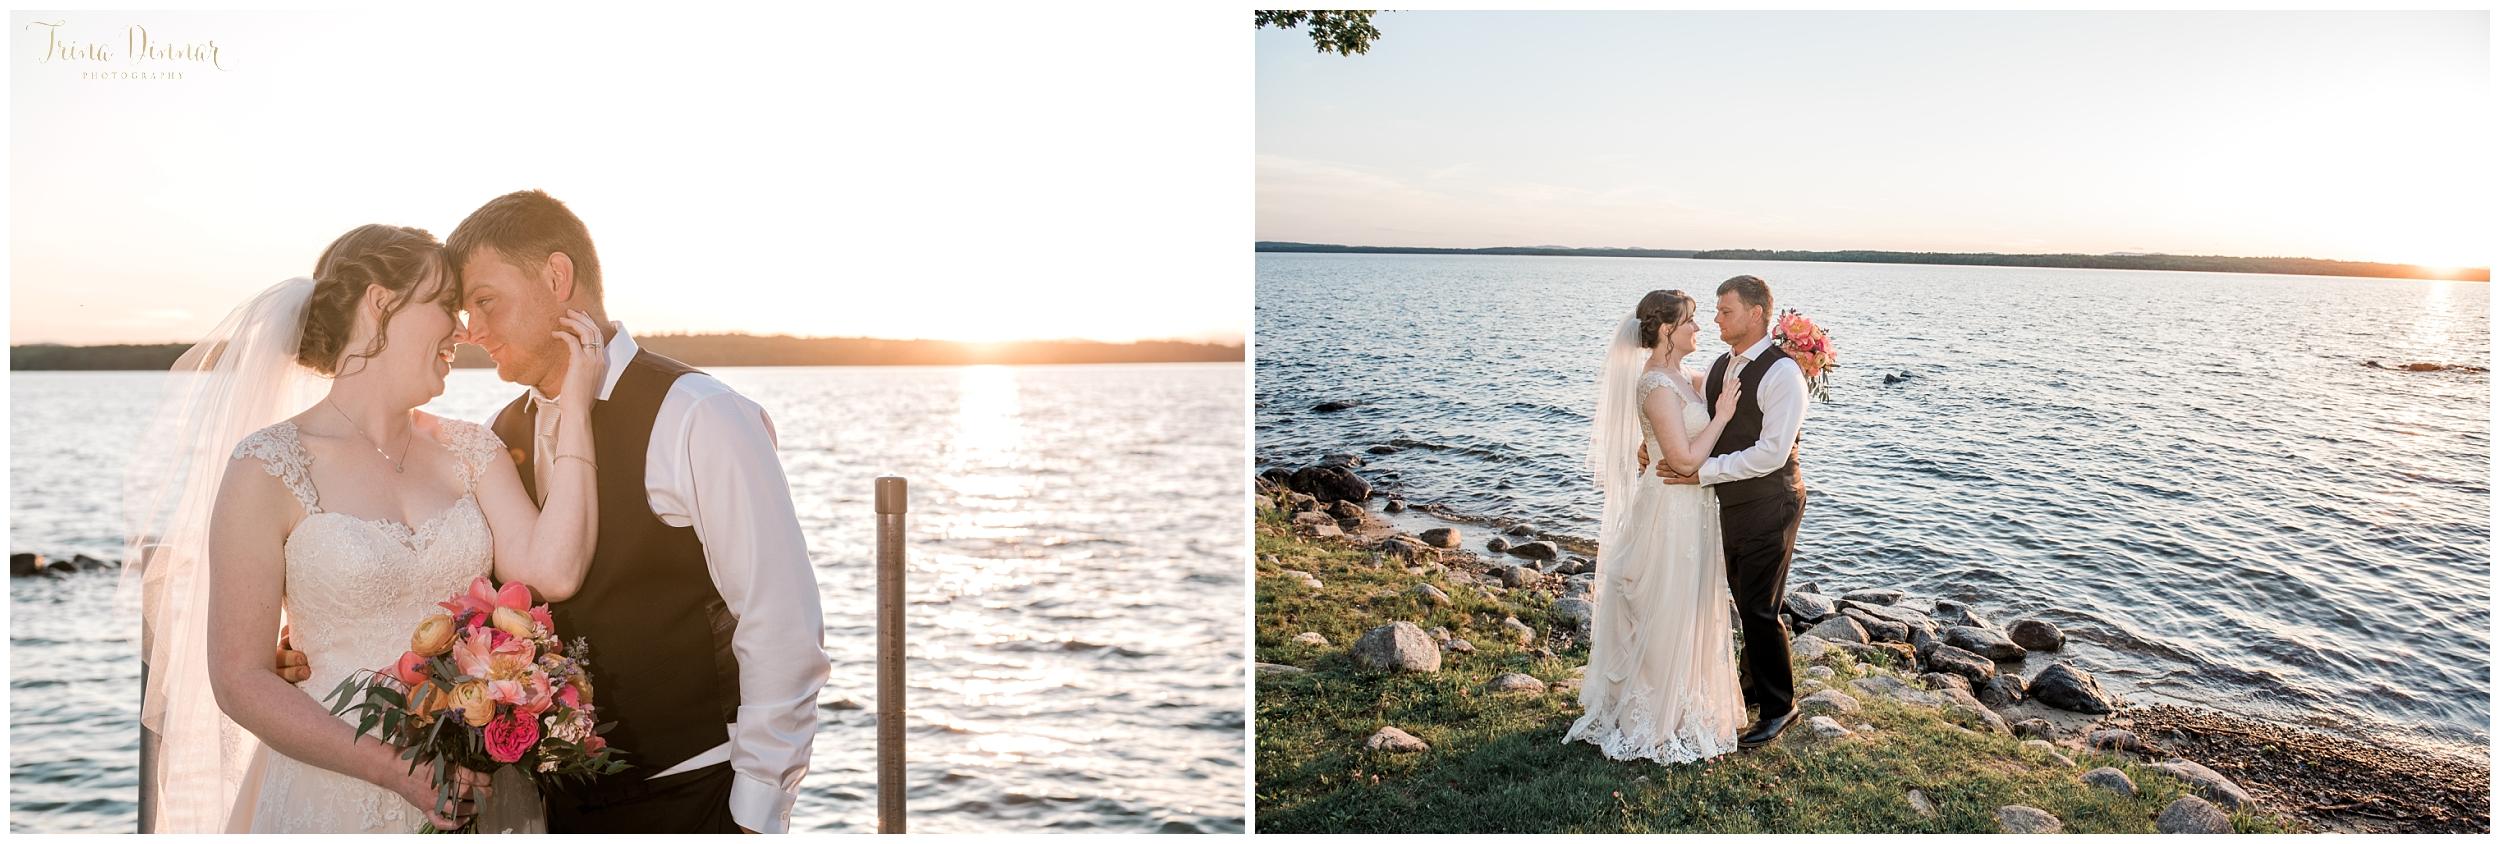 Maine Sebago Lakefront wedding photography by Trina Dinnar